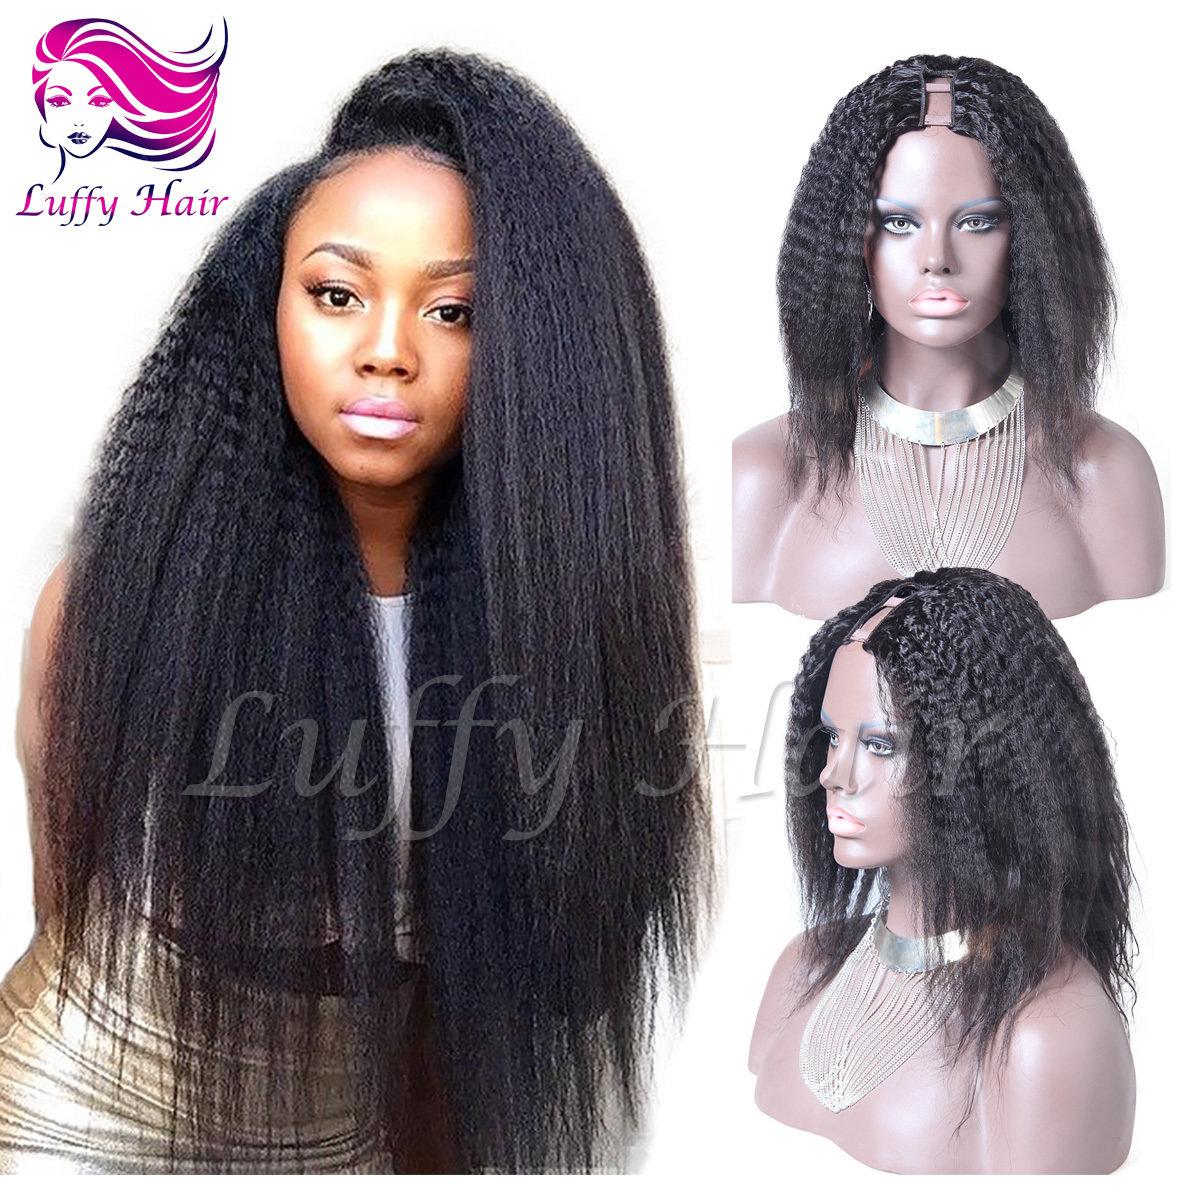 8A Virgin Human Hair Kinky Straight U Part Wig - KWU006